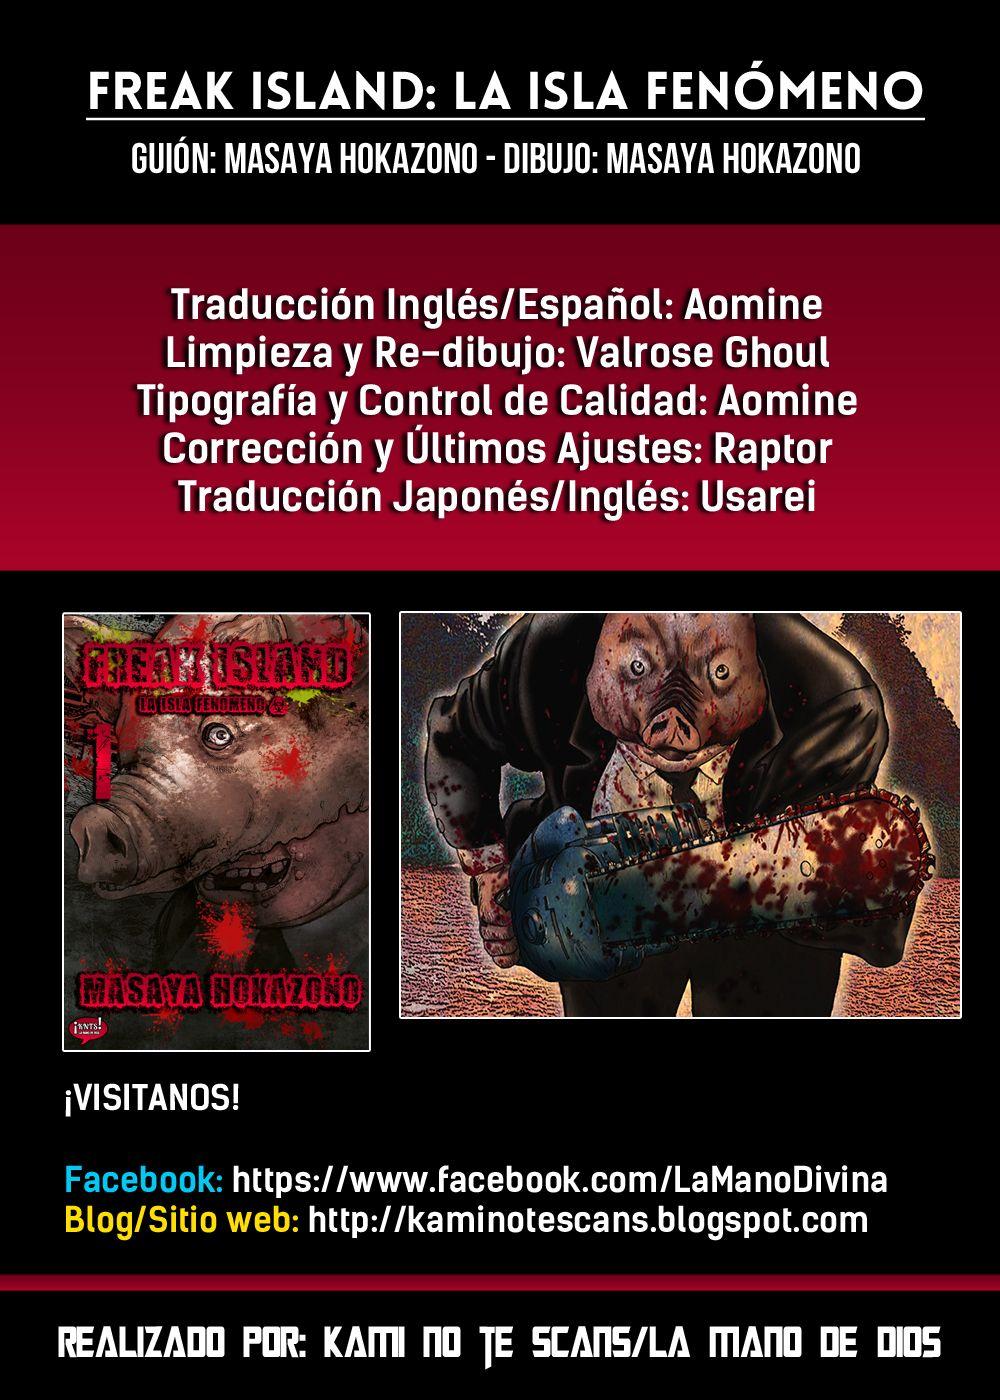 https://c5.ninemanga.com/es_manga/pic2/31/20447/494324/e98c9ba97d1ad89461538b61127884ce.jpg Page 1